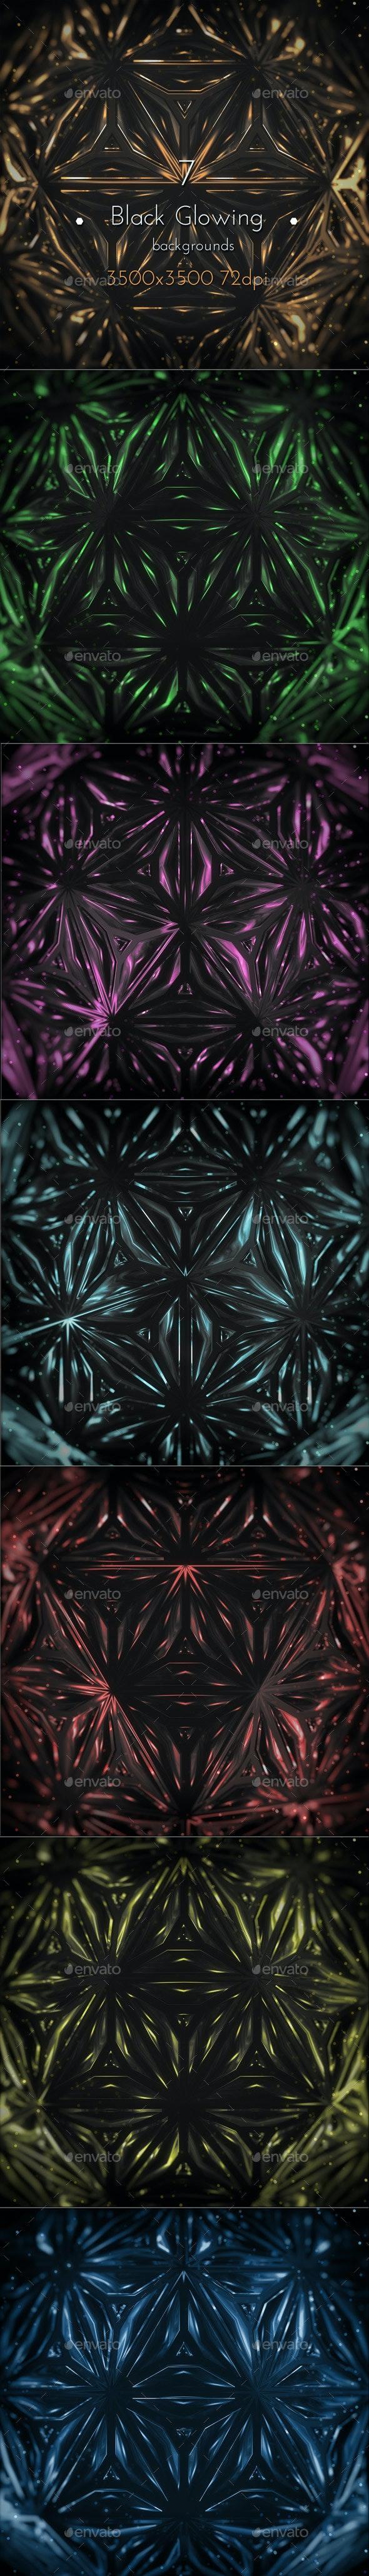 Black Glowing Fantasy Background - Tech / Futuristic Backgrounds